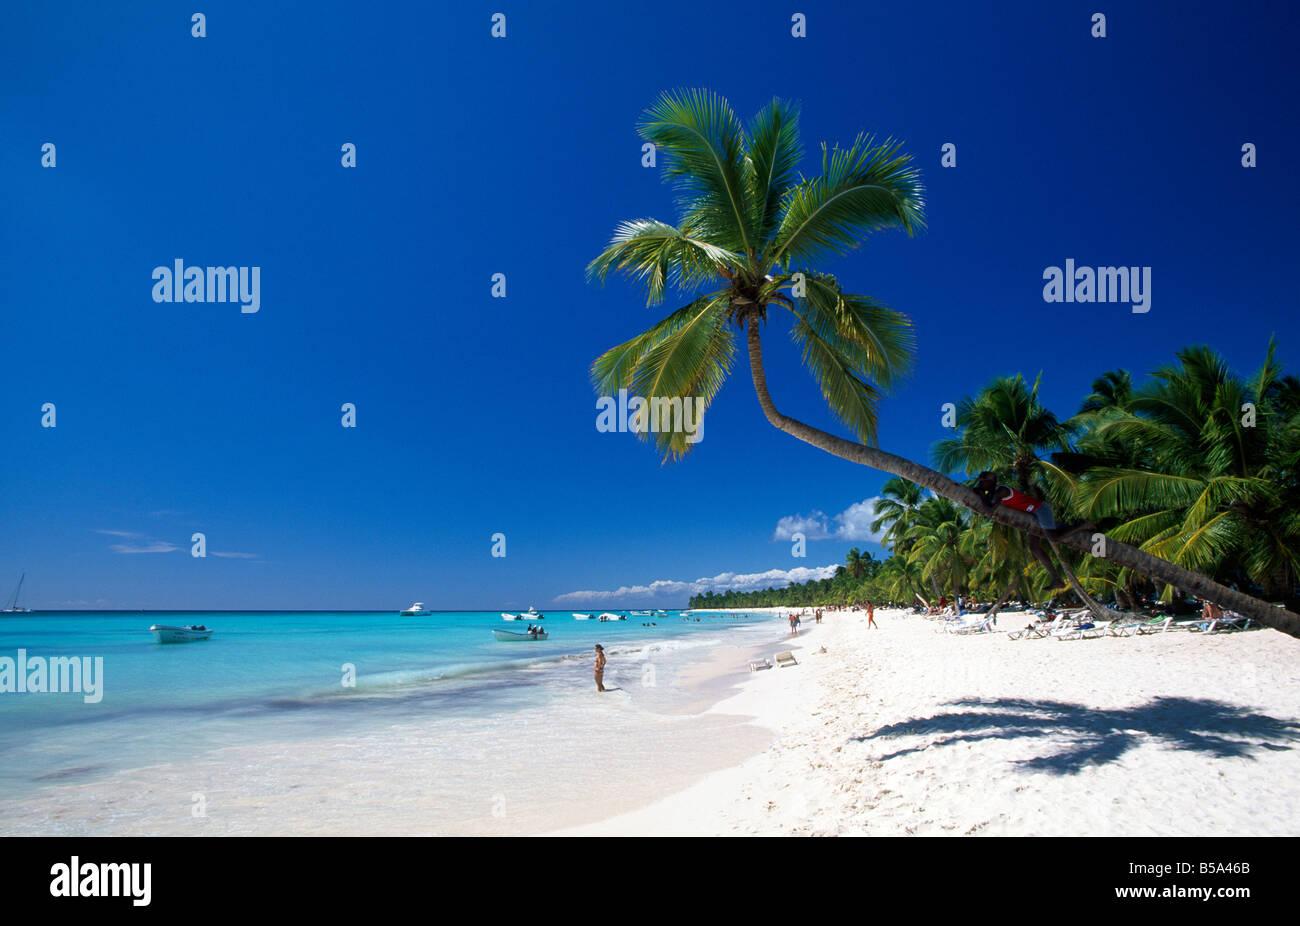 Strand auf Isla Saona Parque Nacional del Este Dominikanische Republik Karibik Stockbild